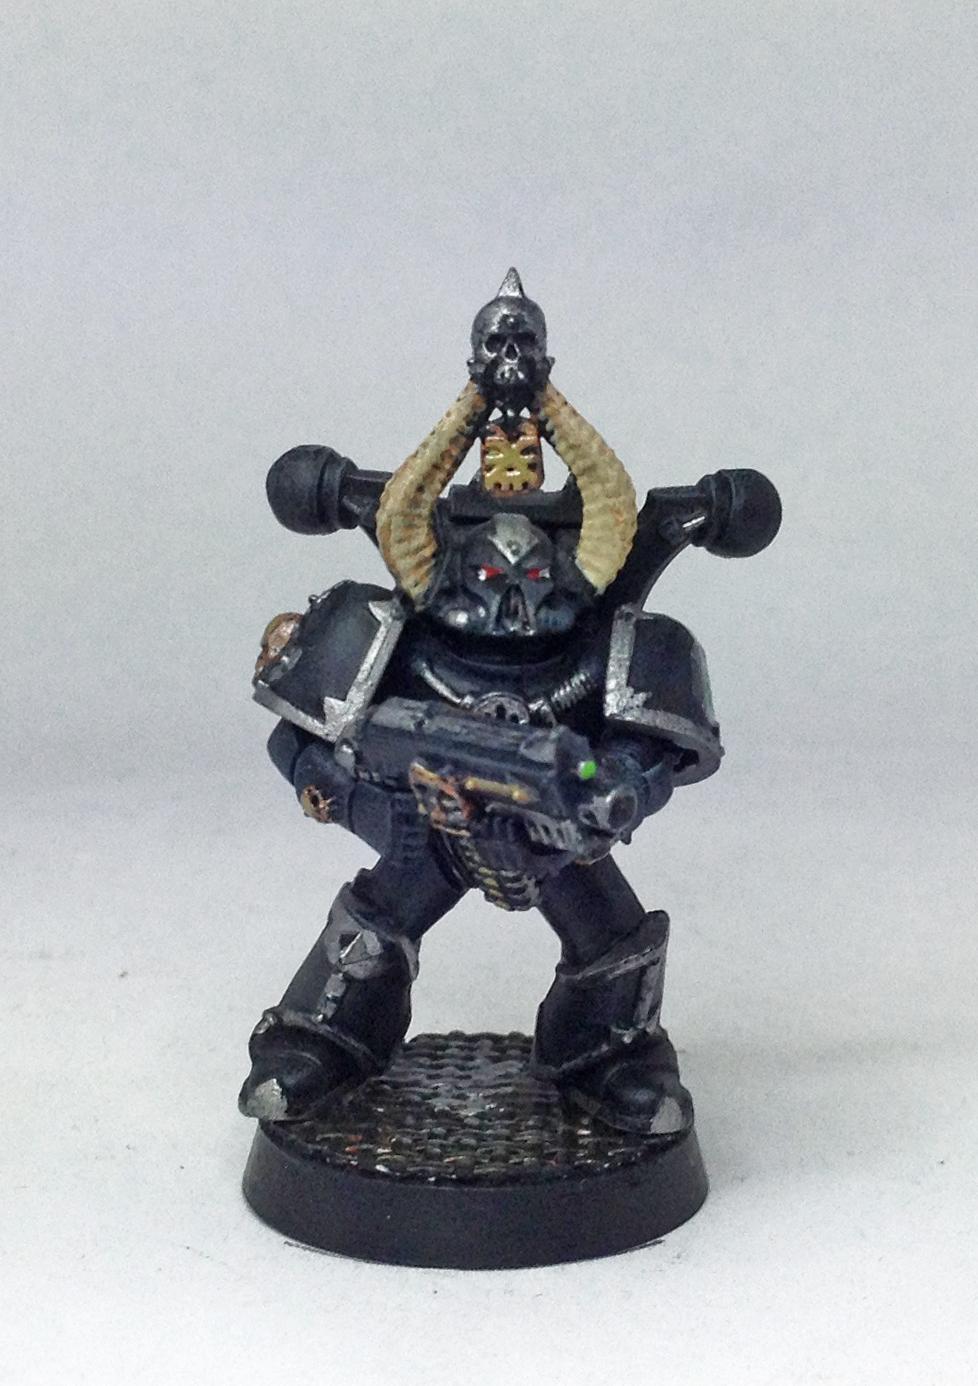 [Space Crusade] Avancement de mon projet IMG_5512